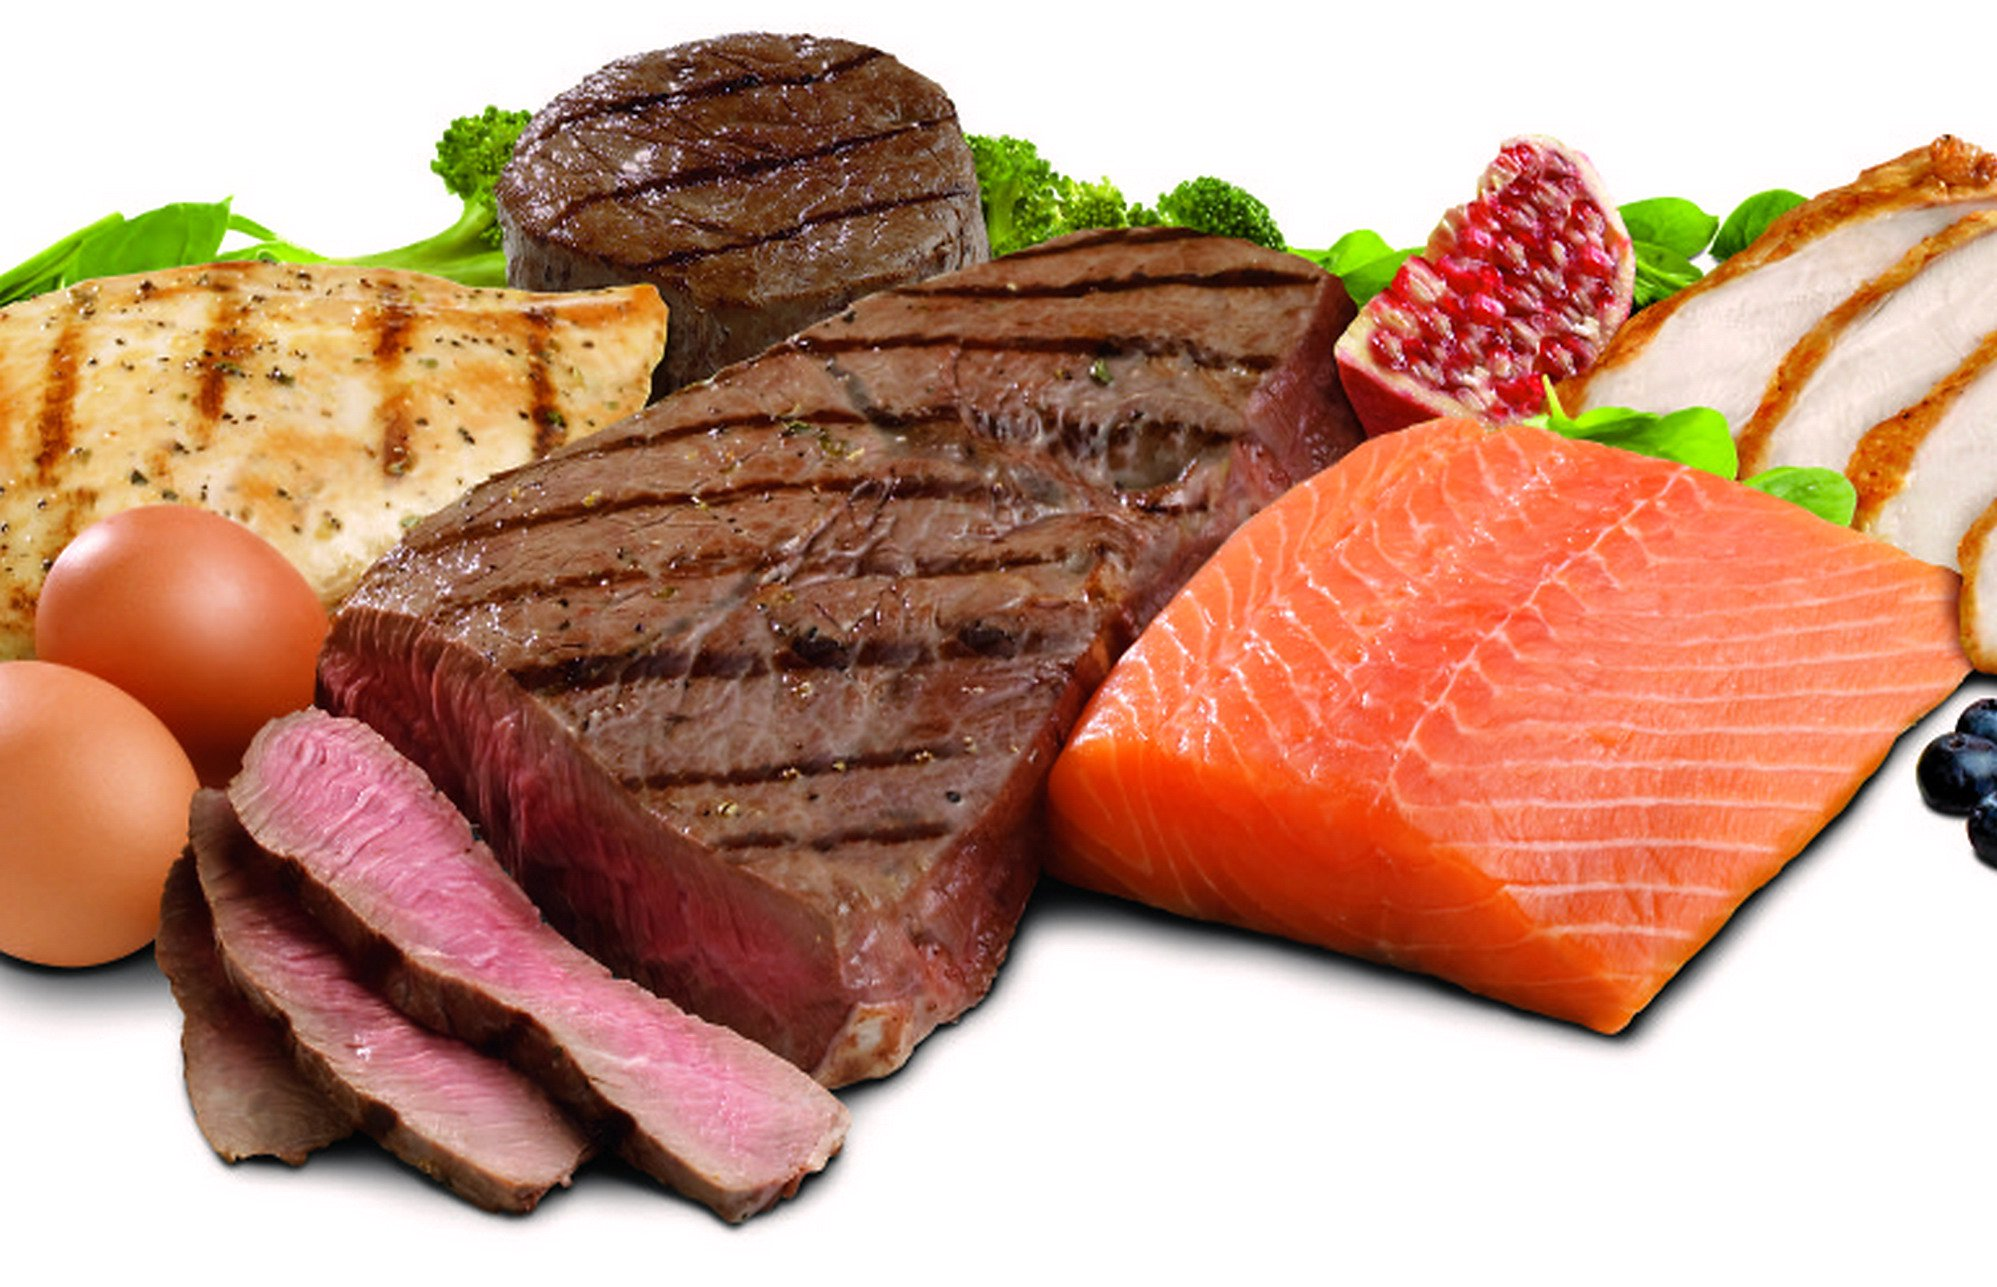 Dieta me proteina dhe perime me pak kalori